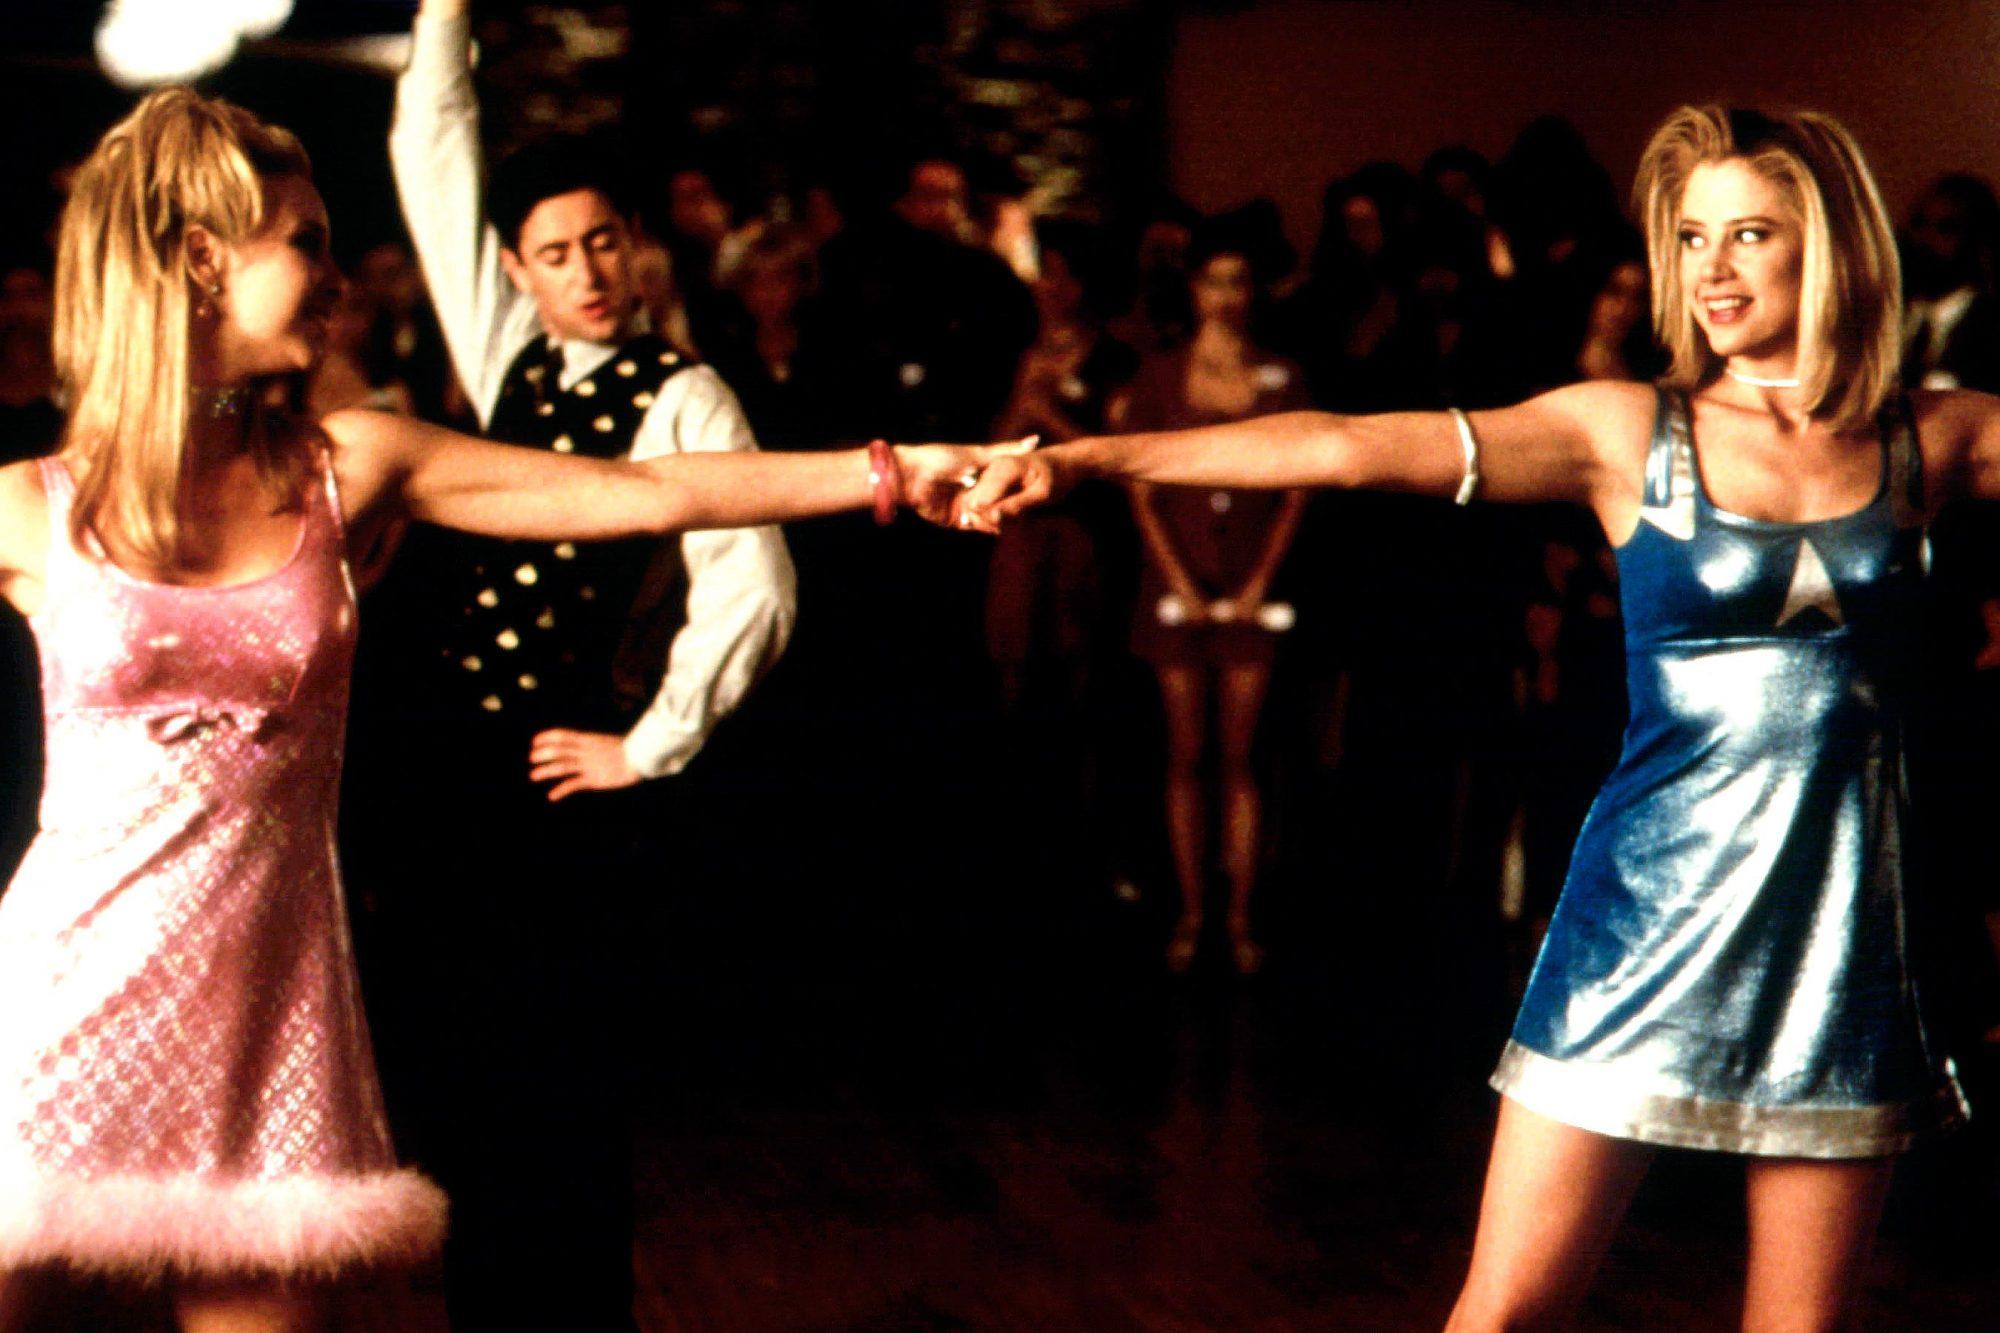 ROMY AND MICHELE'S HIGH SCHOOL REUNION, from left: Lisa Kudrow, Alan Cumming, Mira Sorvino, 1997, u00A9